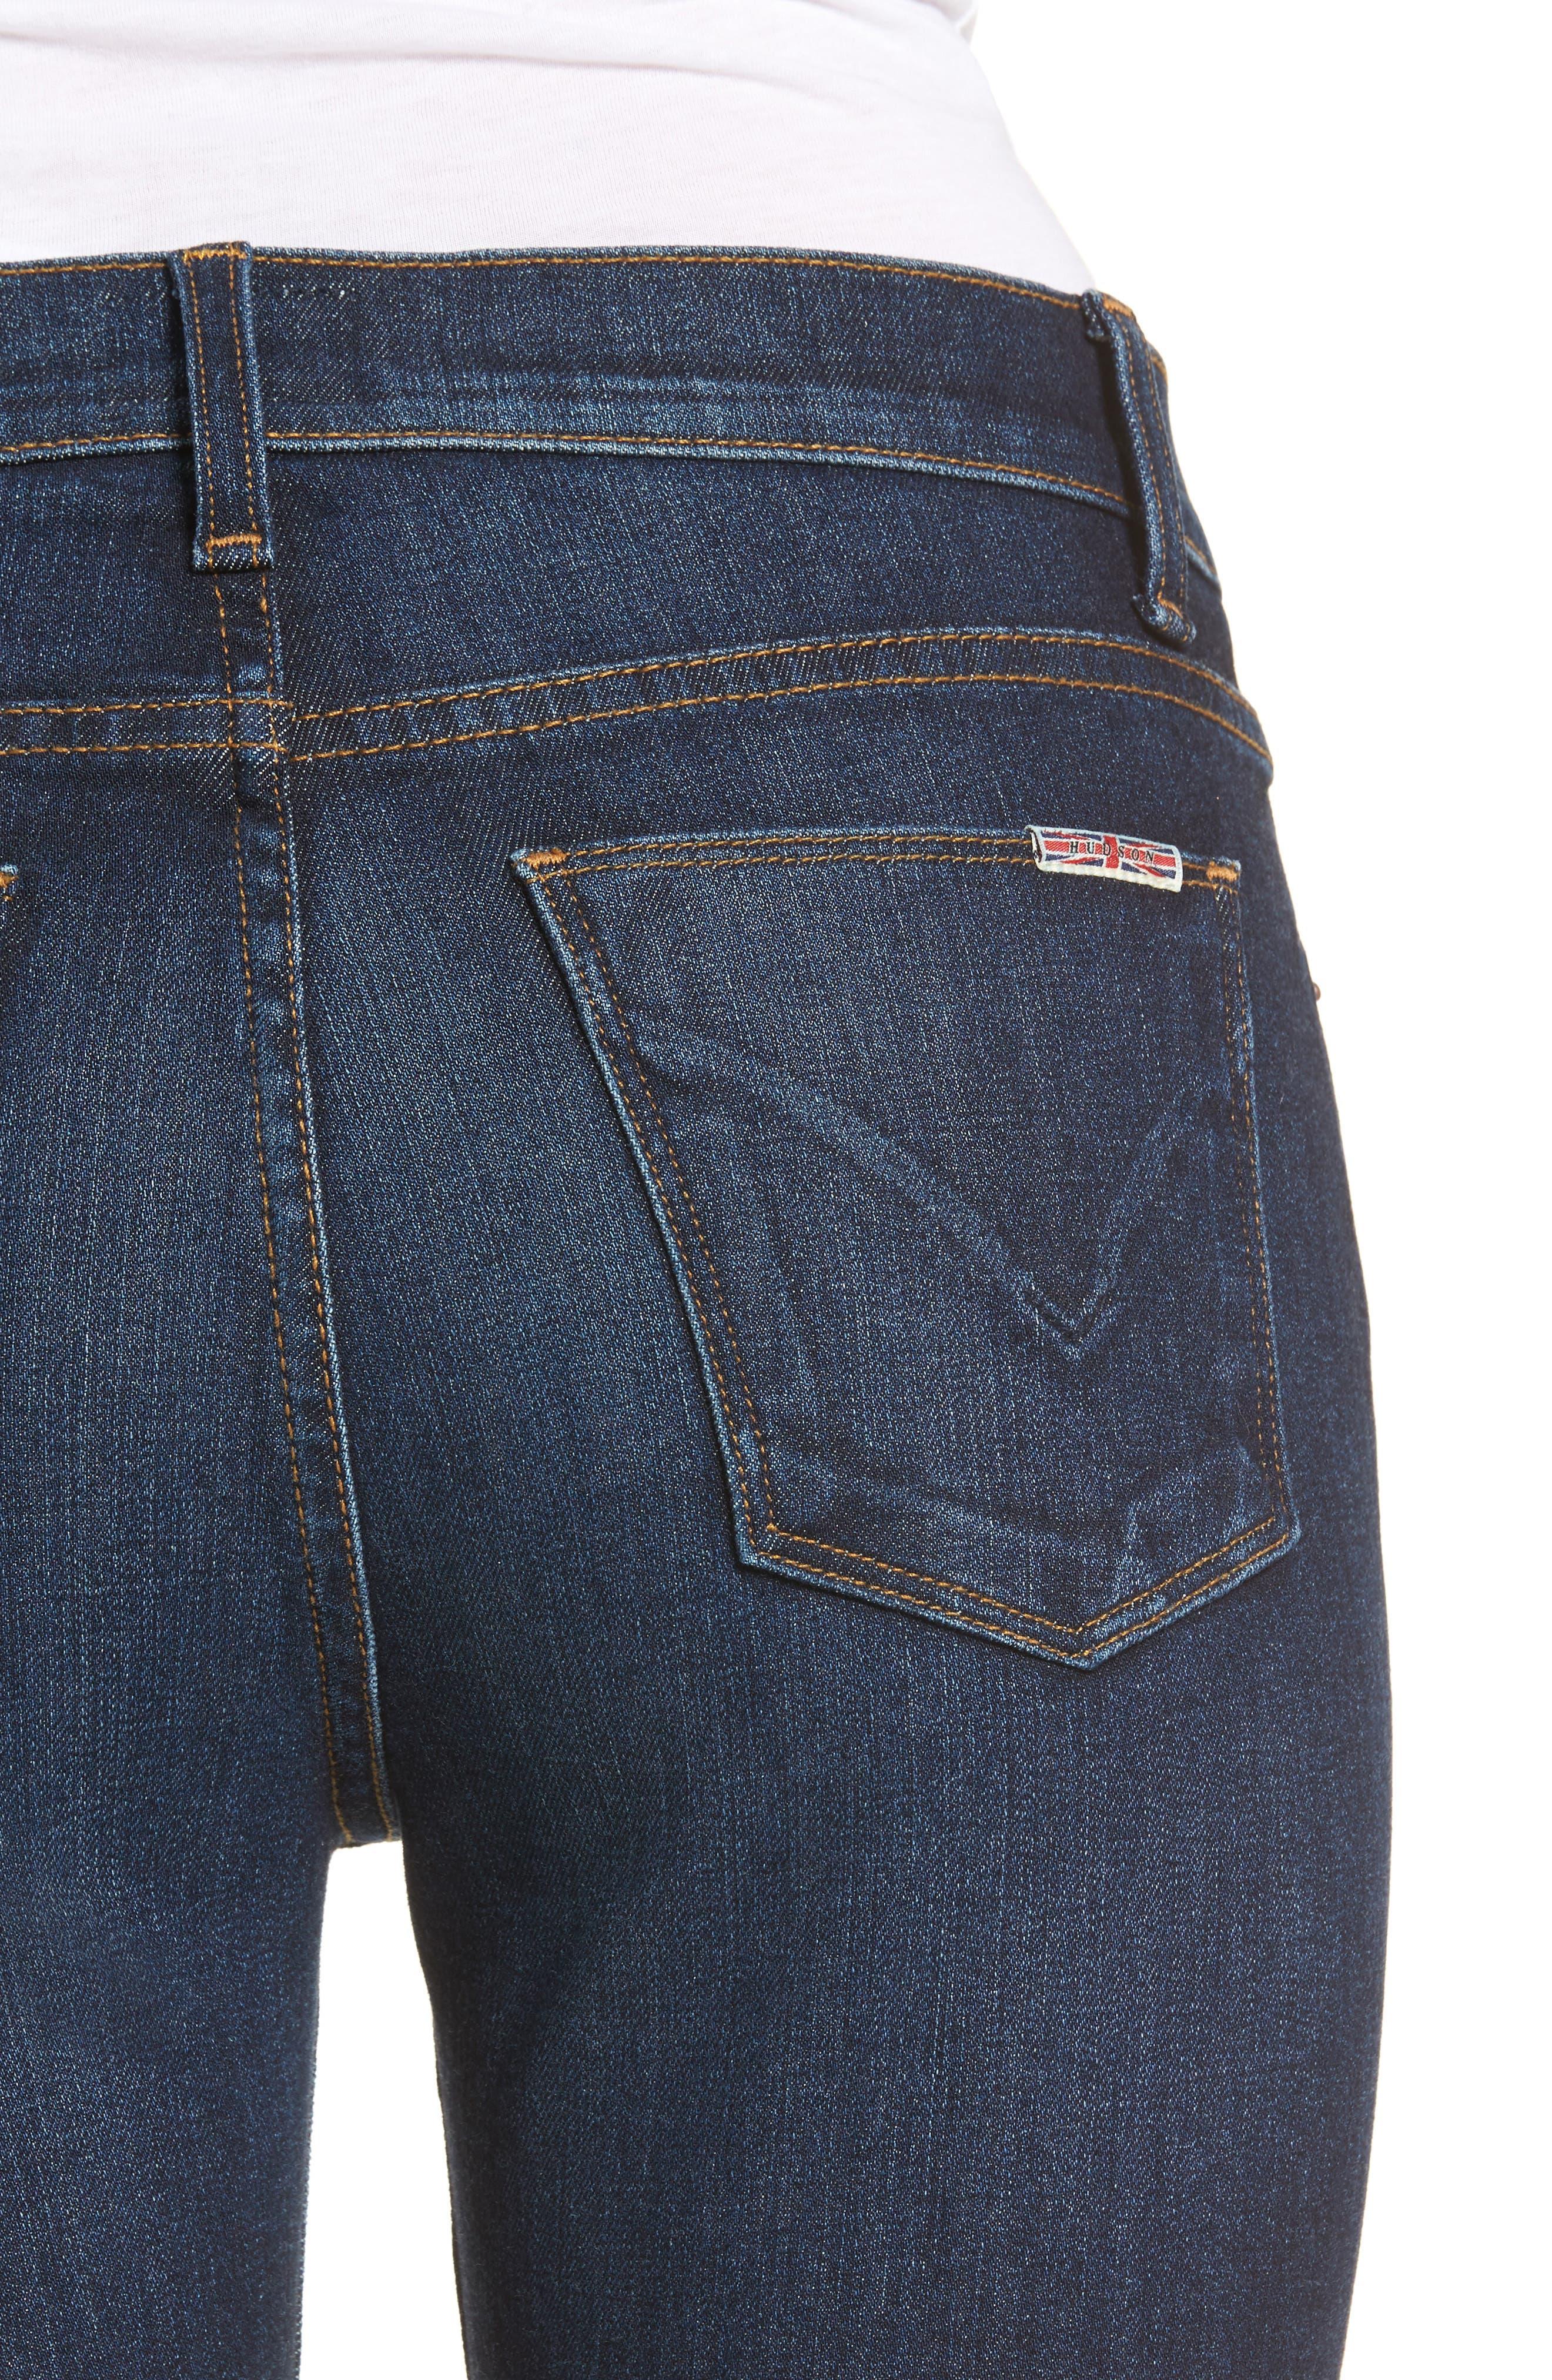 Barbara High Waist Ankle Super Skinny Jeans,                             Alternate thumbnail 4, color,                             402